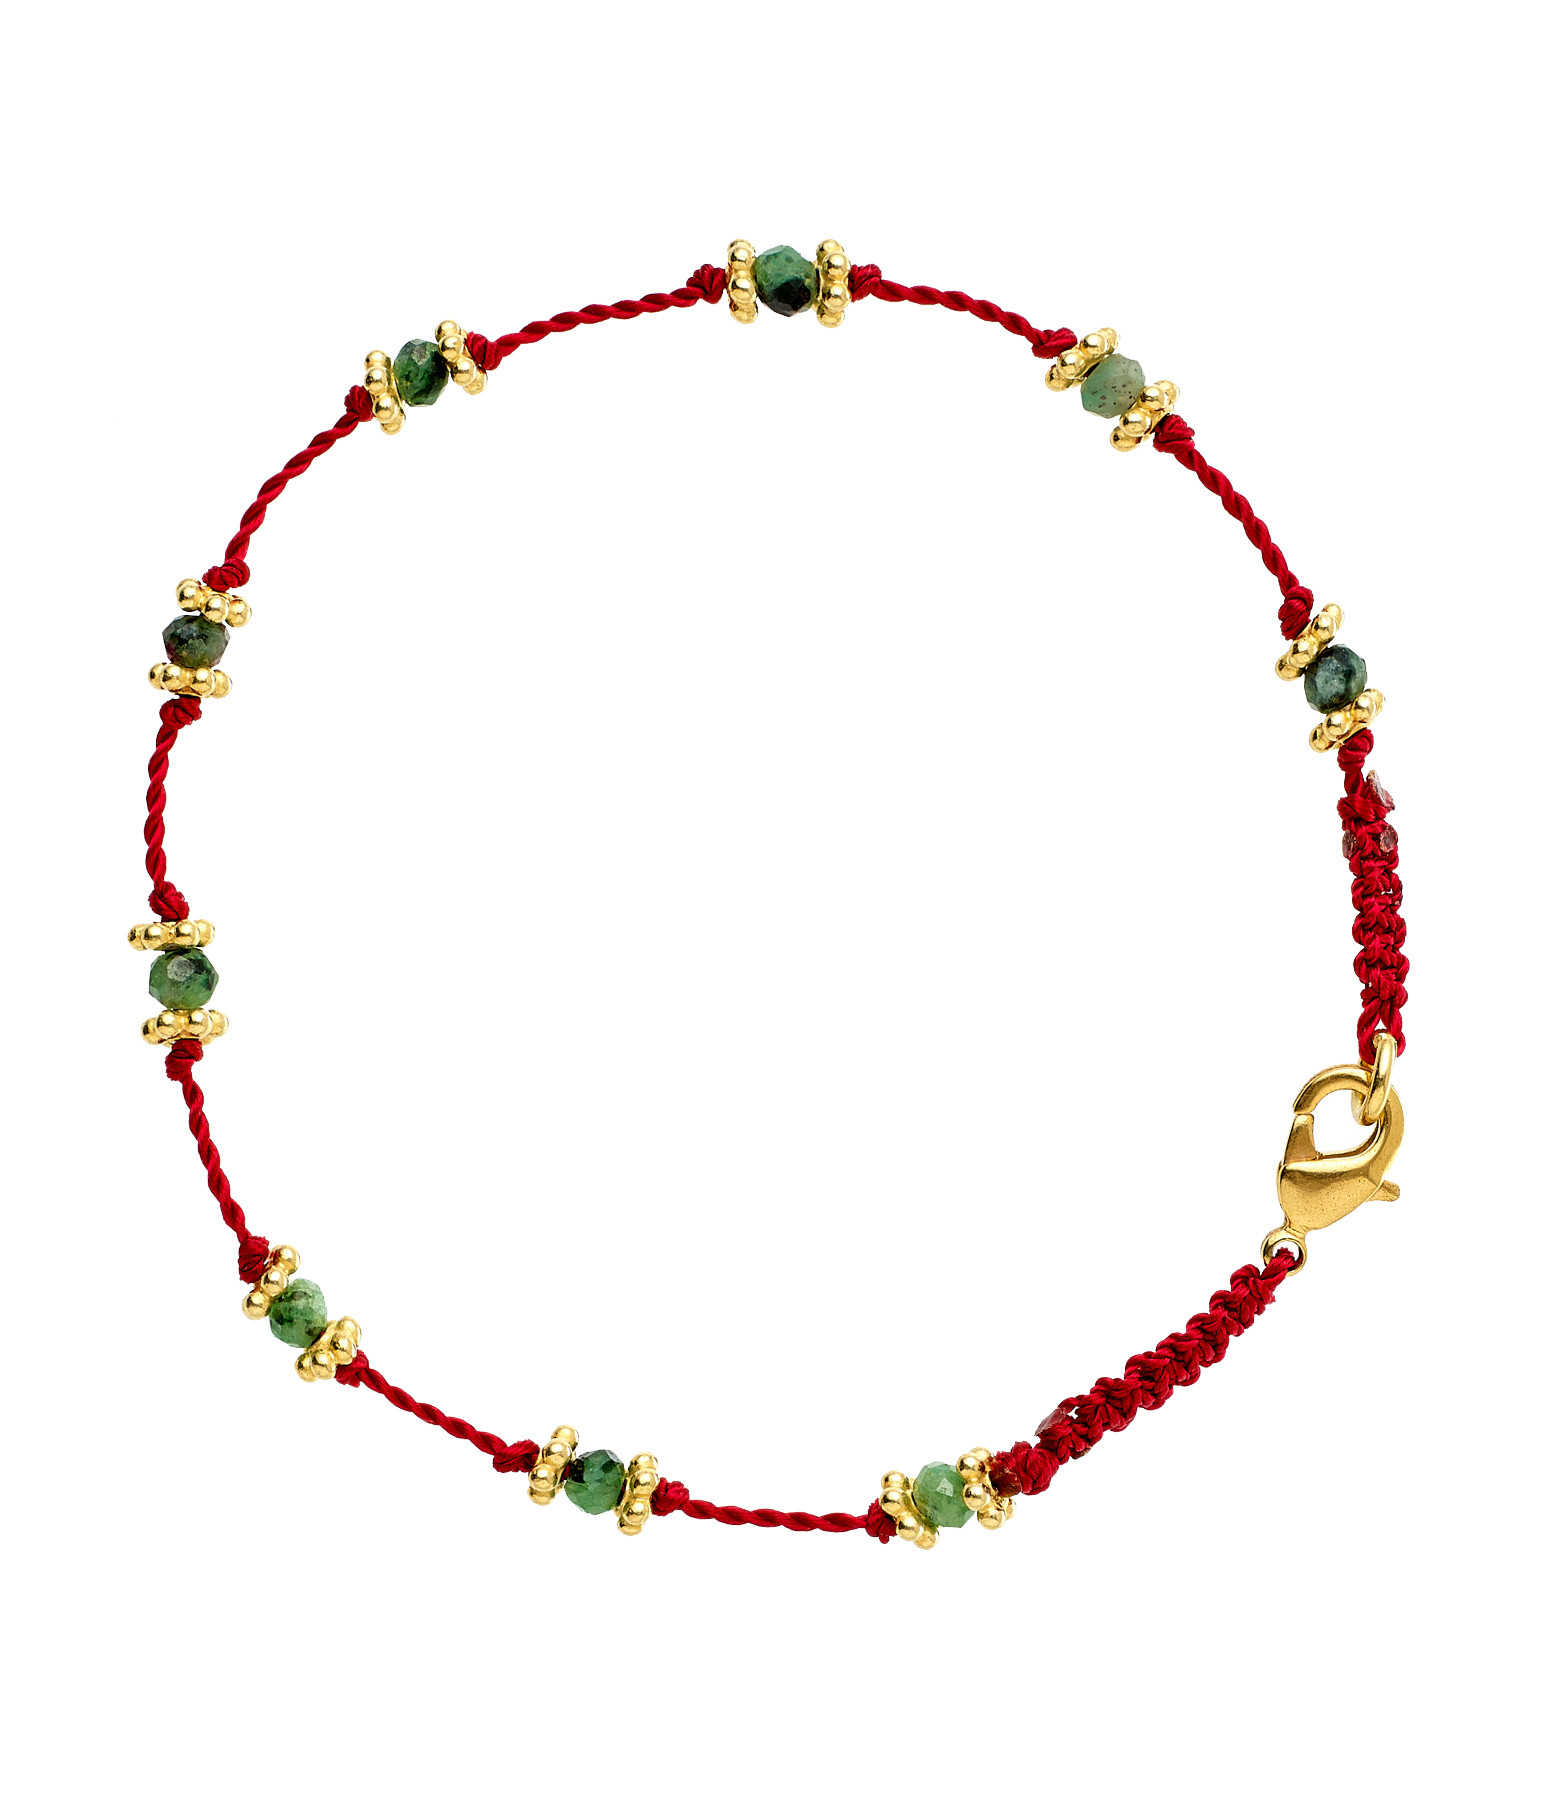 TITYARAVY - Bracelet Lotus Rouge Rubisoizite Plaqué Or